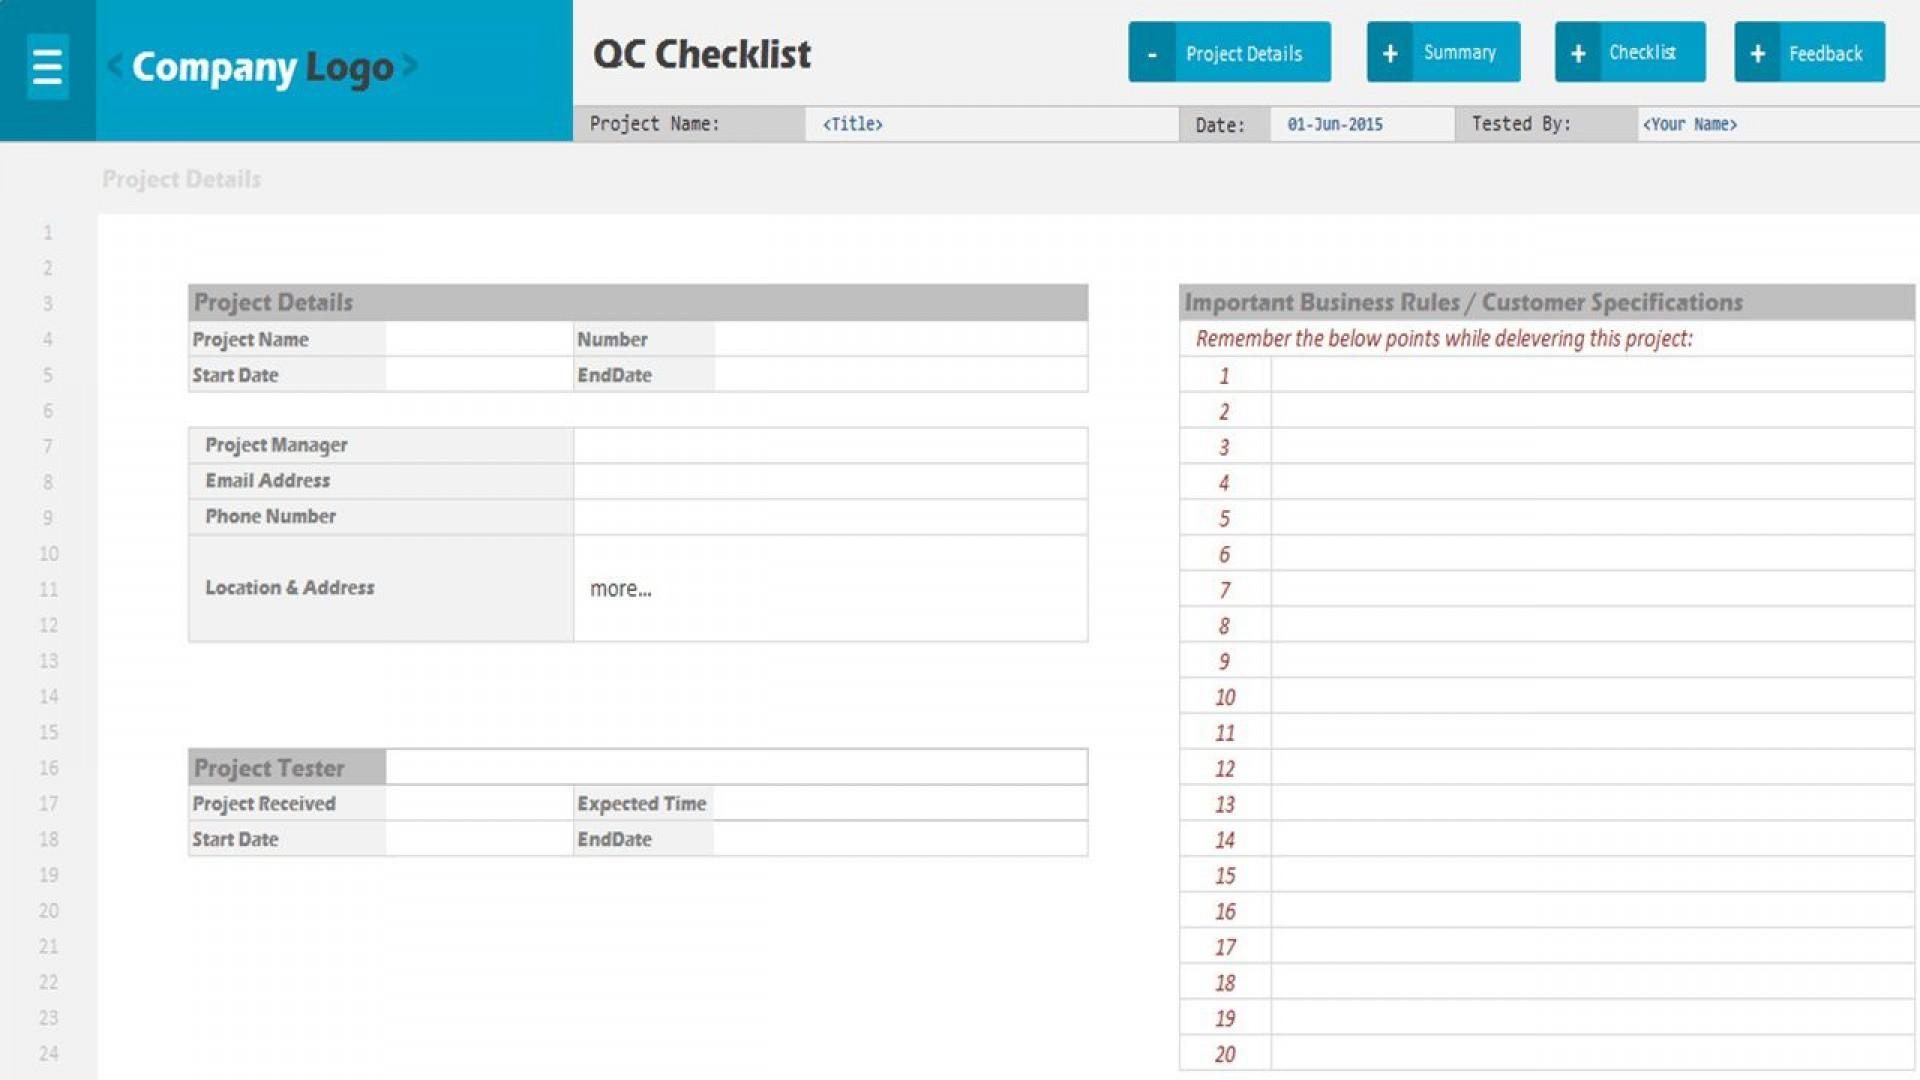 009 Stupendou Project Management Checklist Template Sample  Audit Excel Plan1920